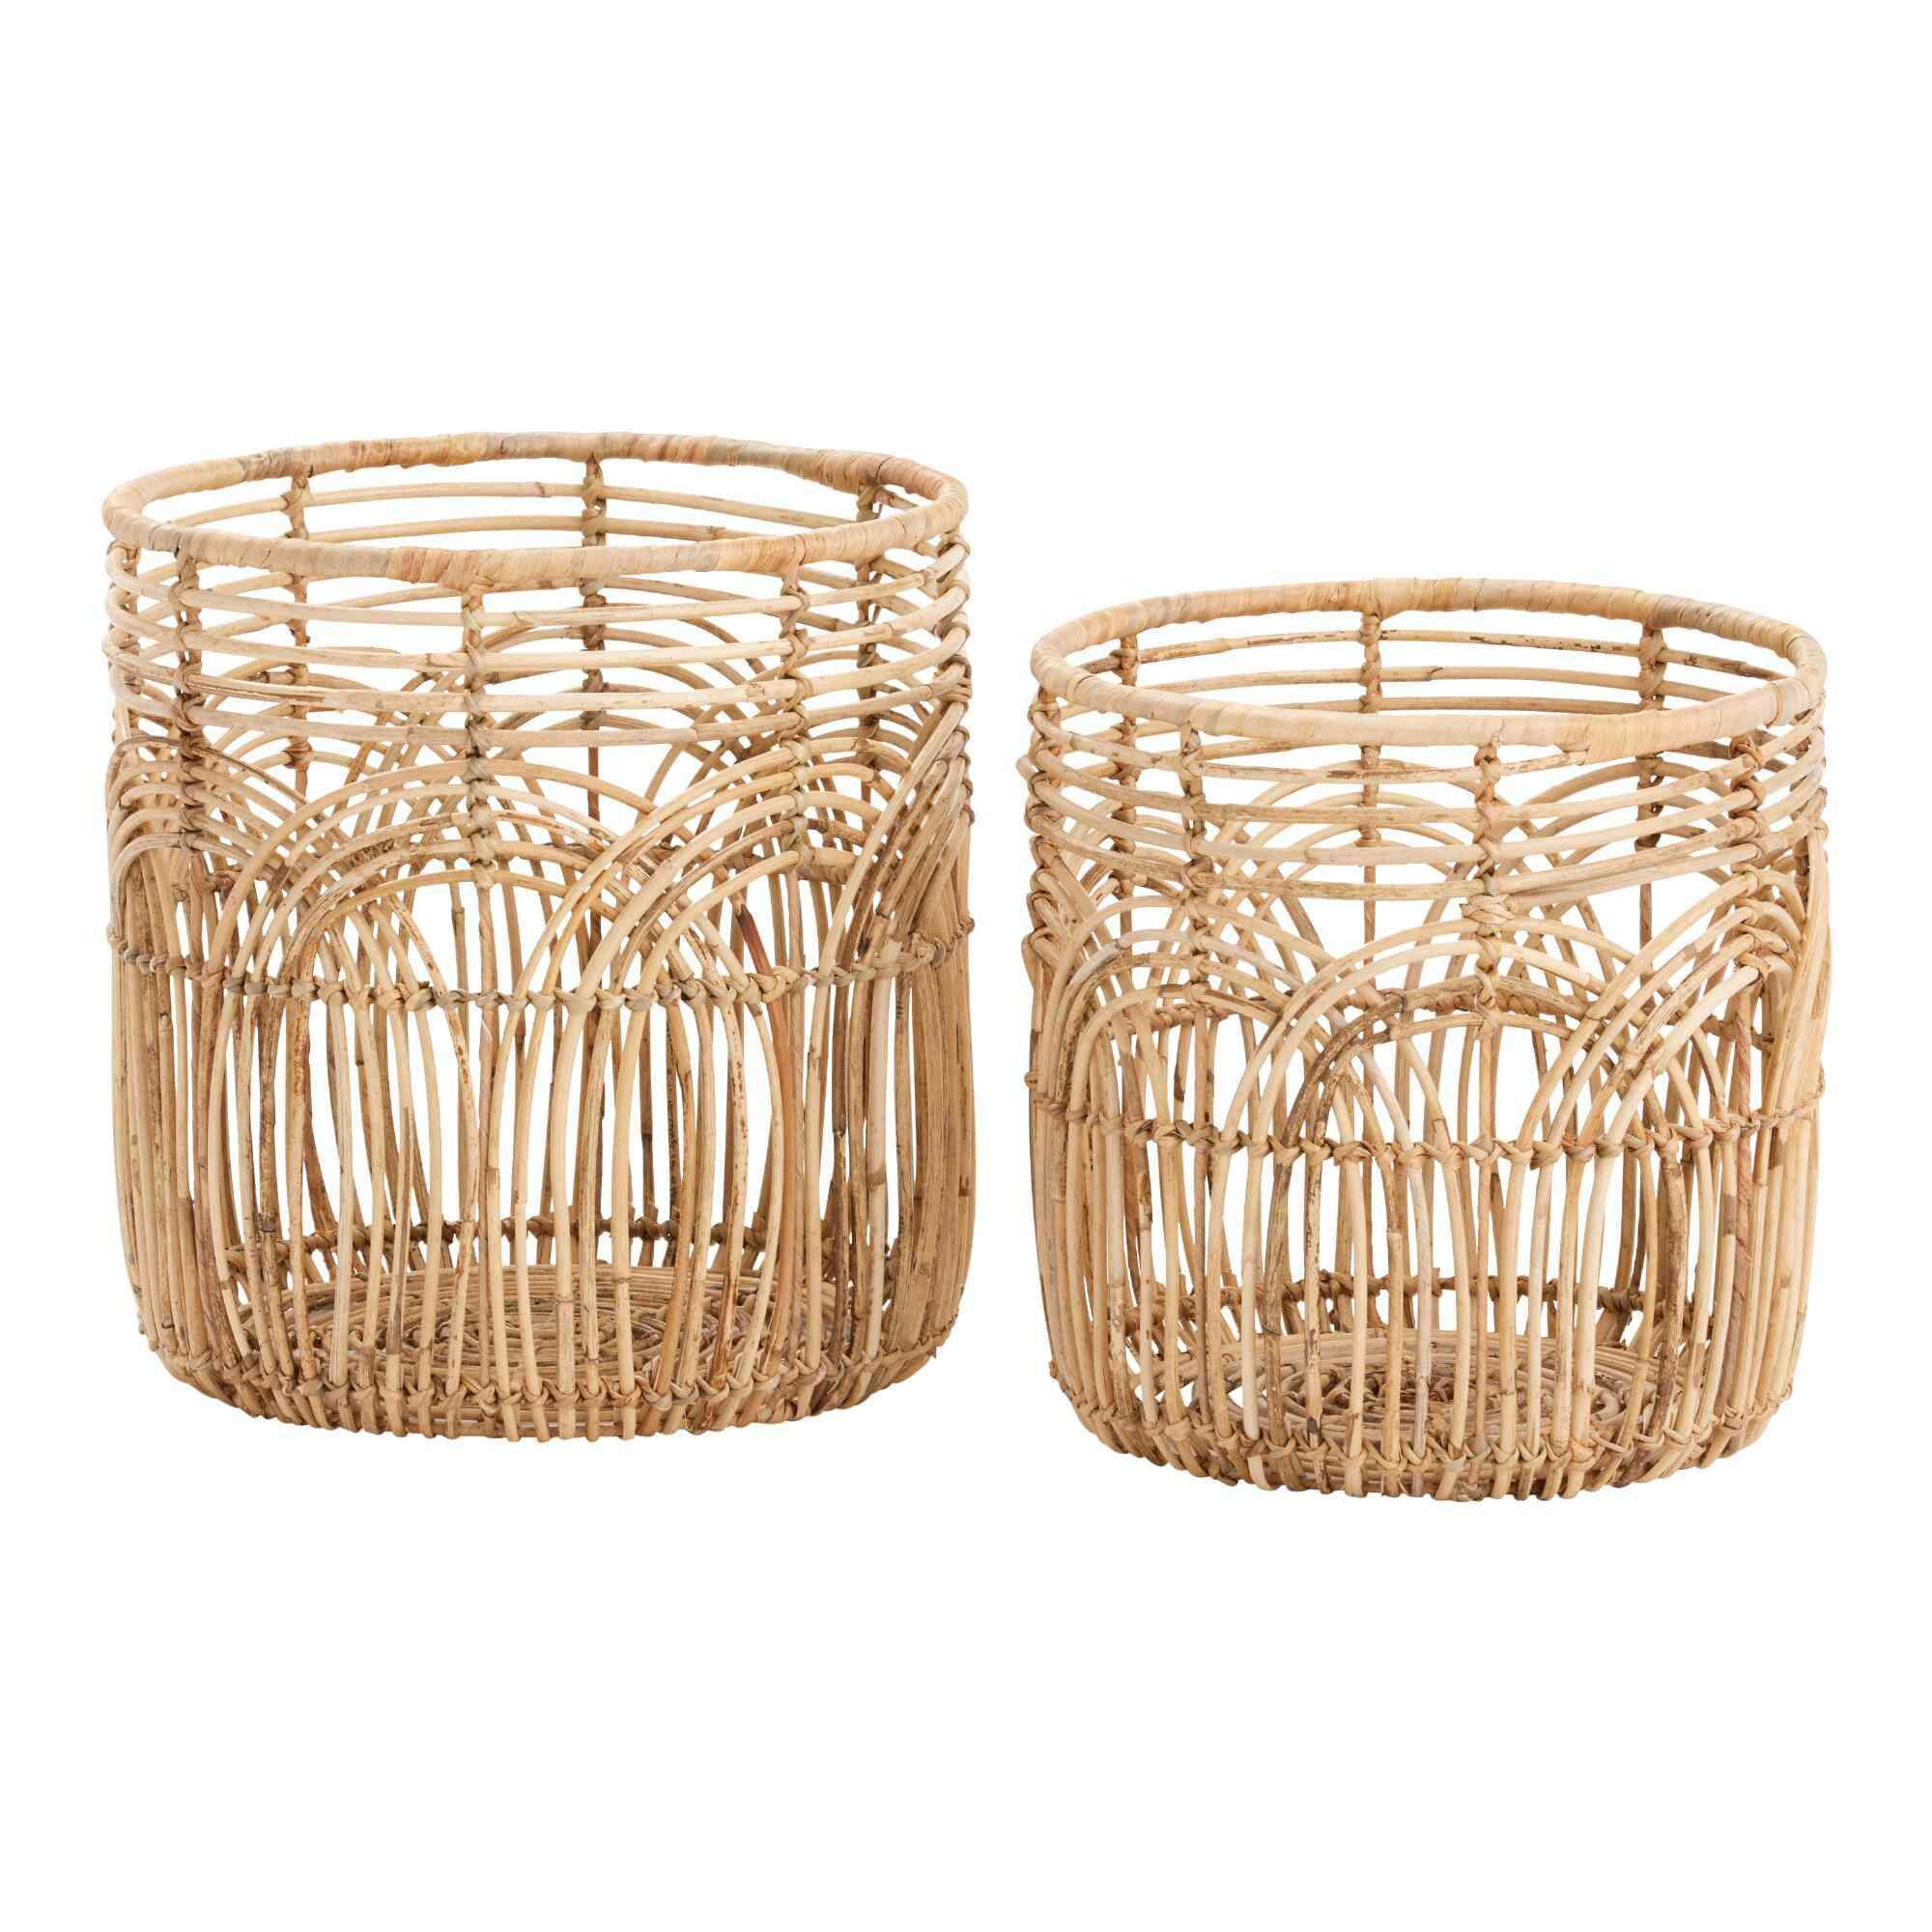 Natural Rattan Open Weave Waverly Basket